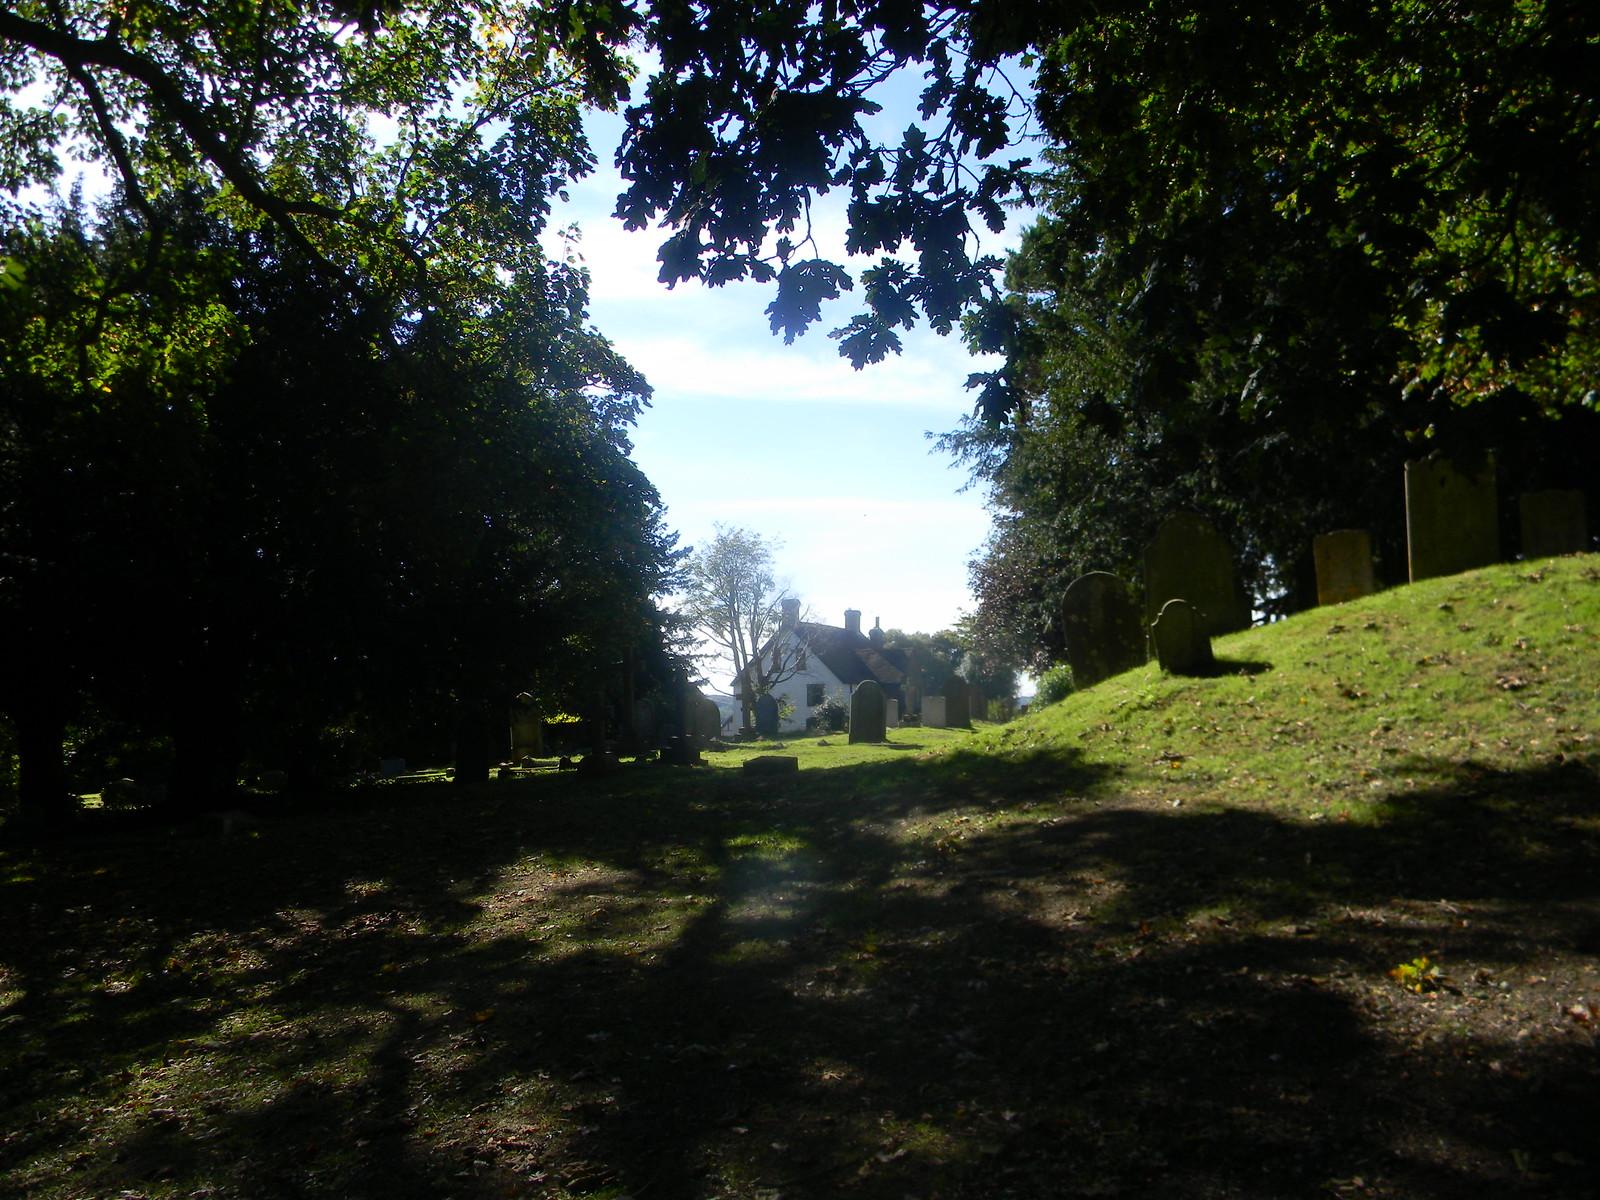 Approaching Burwash churchyard Stonegate Circular